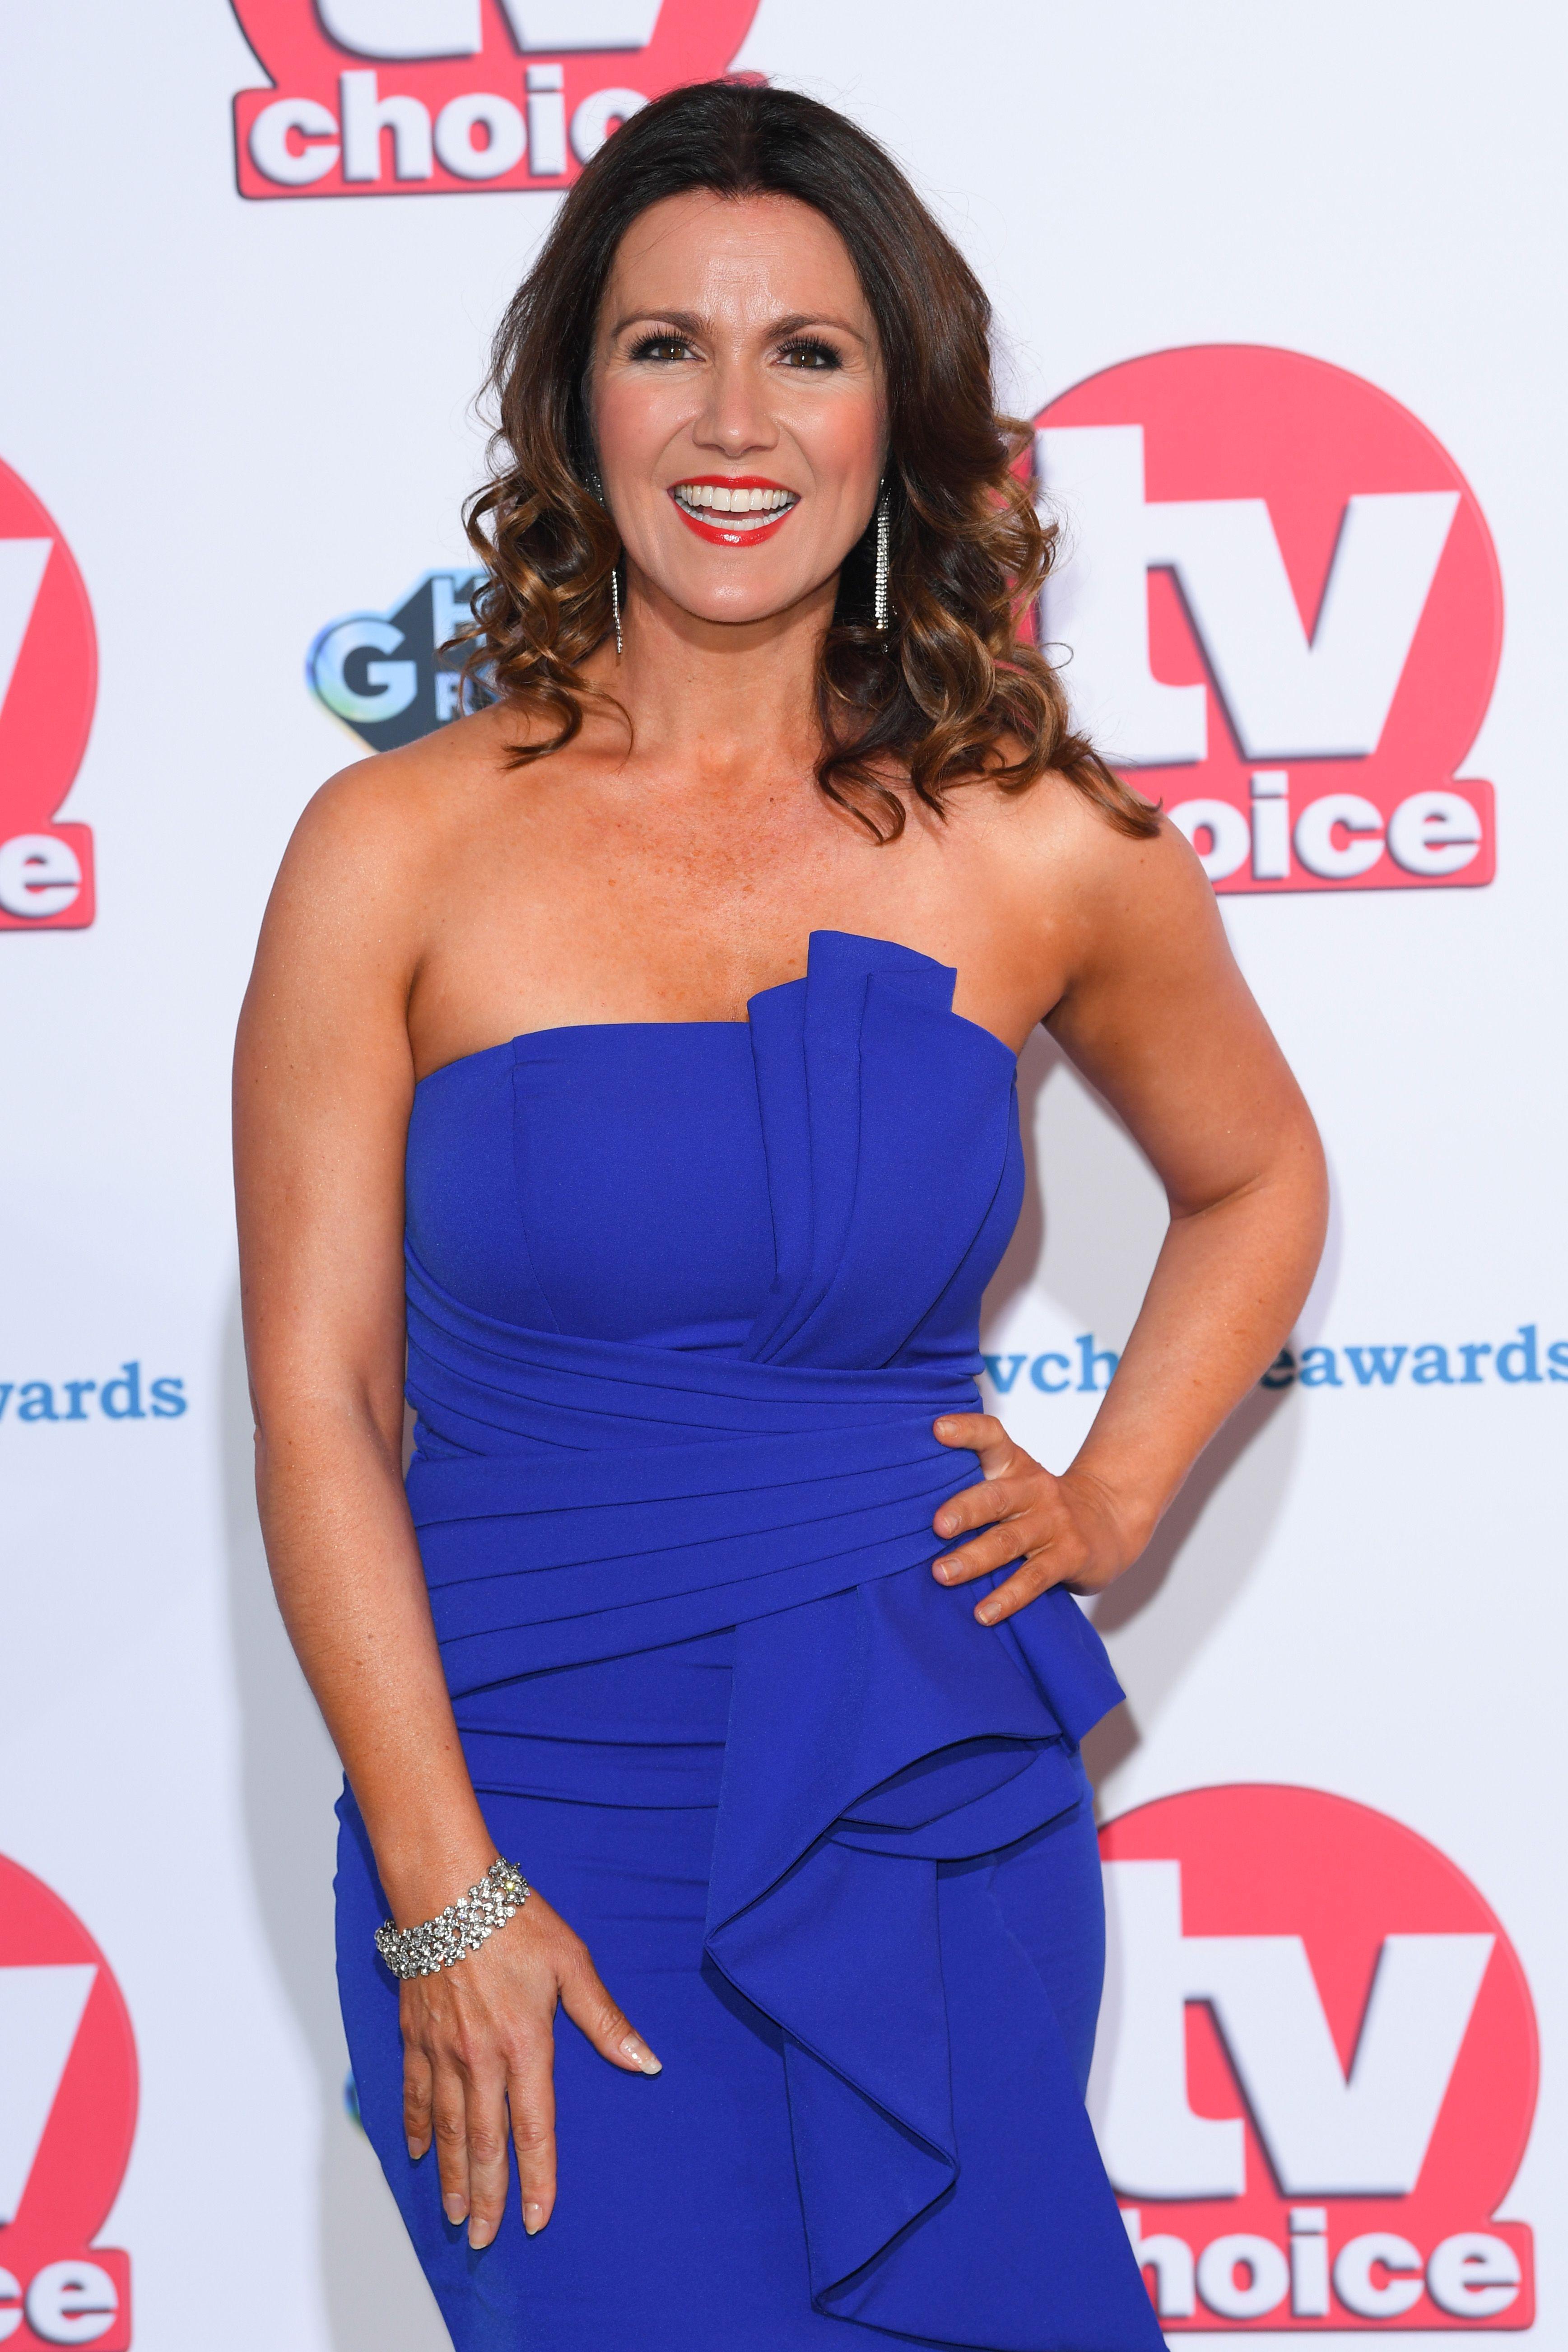 Susanna Reid wows in £39 high street dress at TV Choice Awards